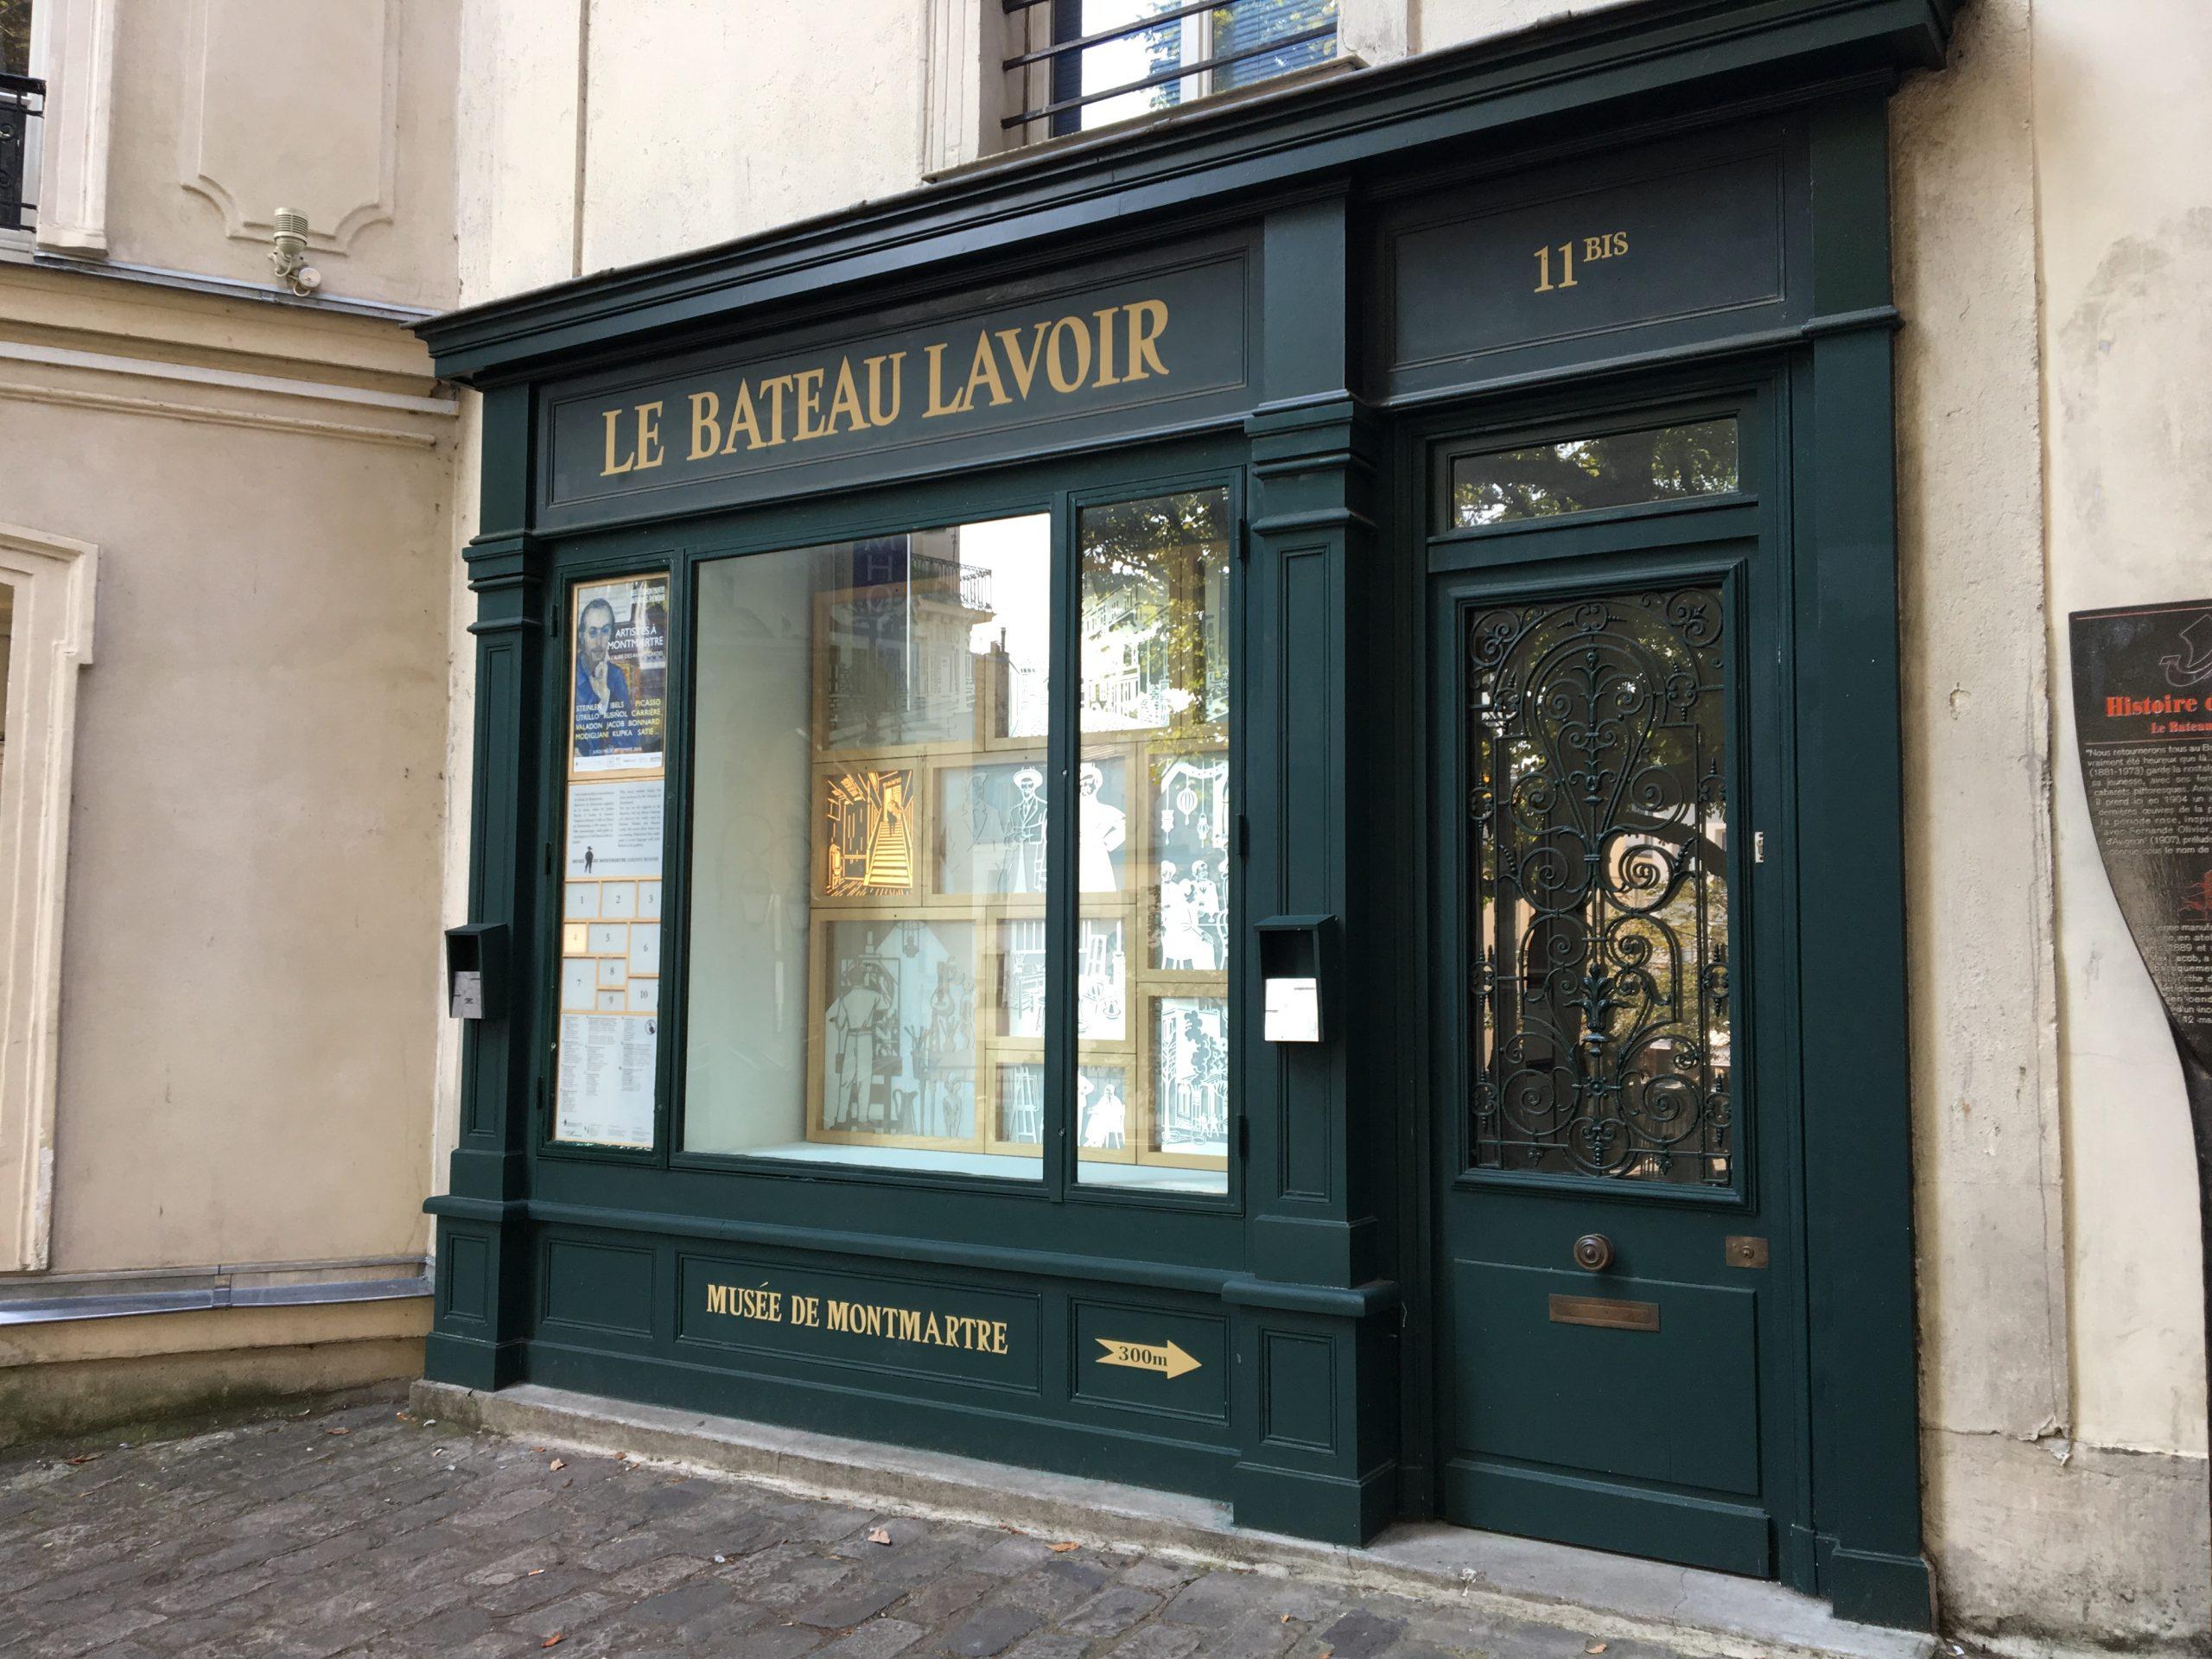 Le Bateau-Lavoir – artystyczna pralnia w sercu Montmartre